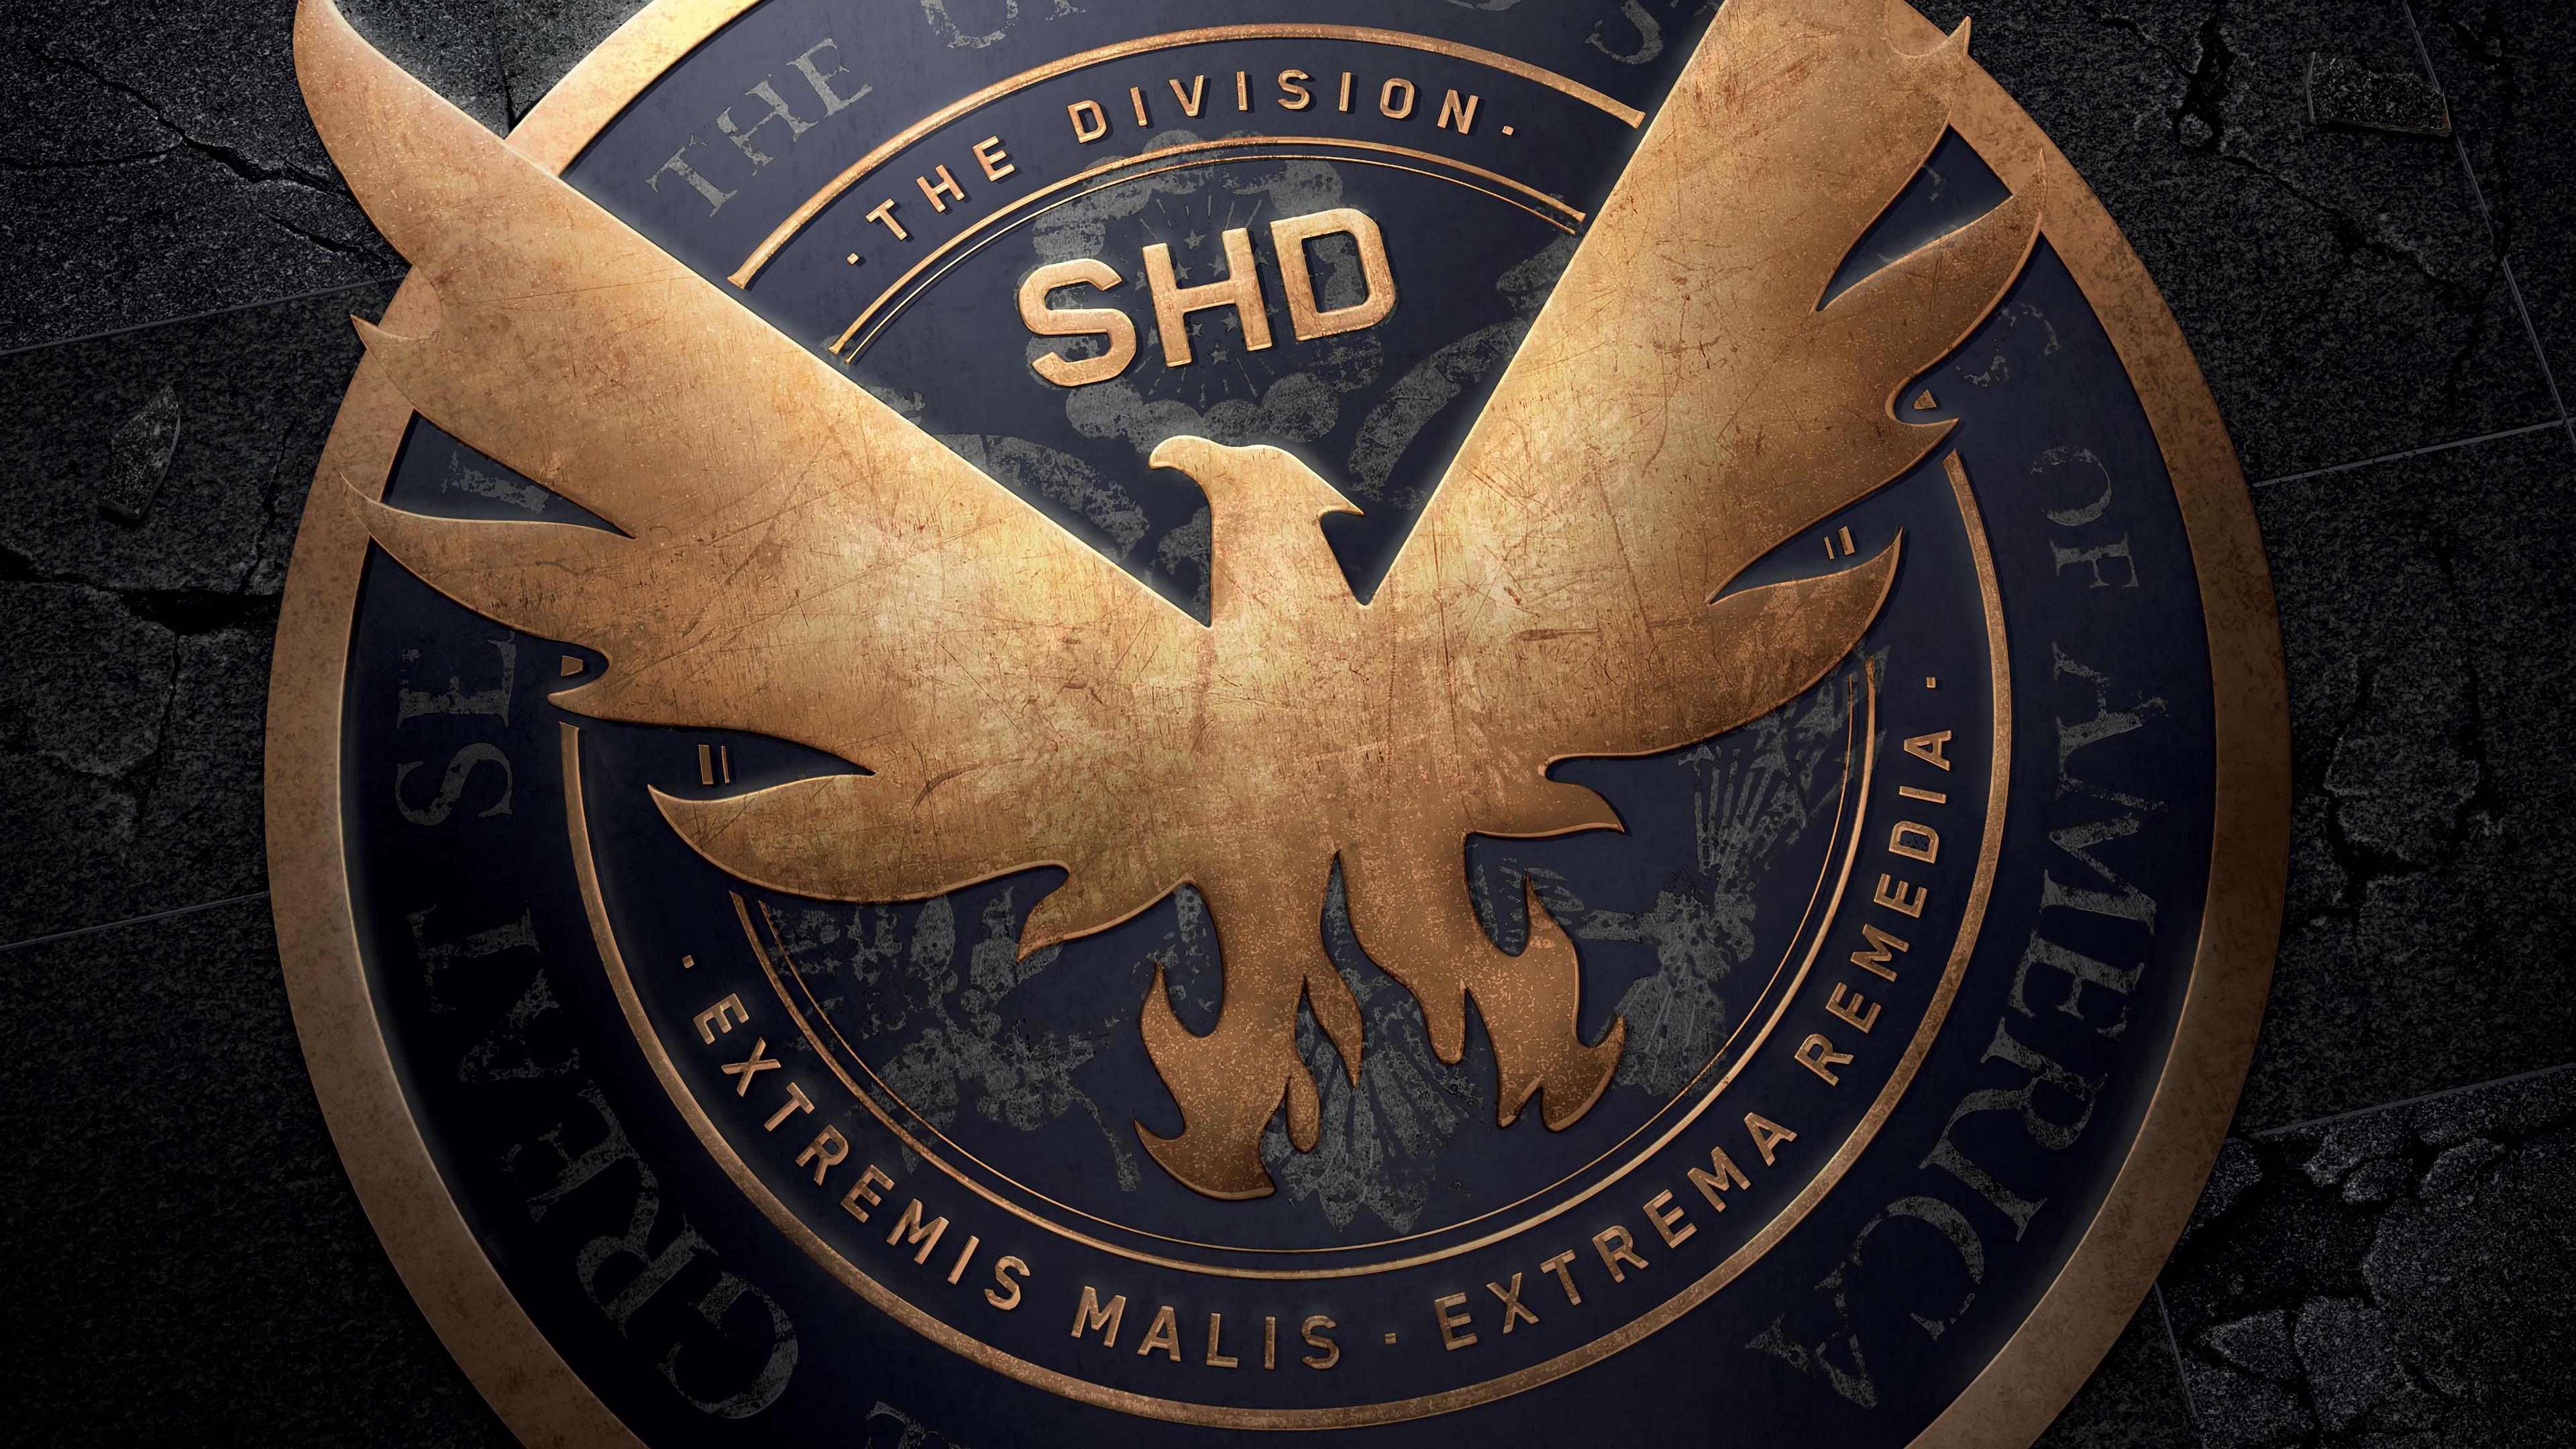 The Division 2 Shd Logo 4k Wallpaper 3